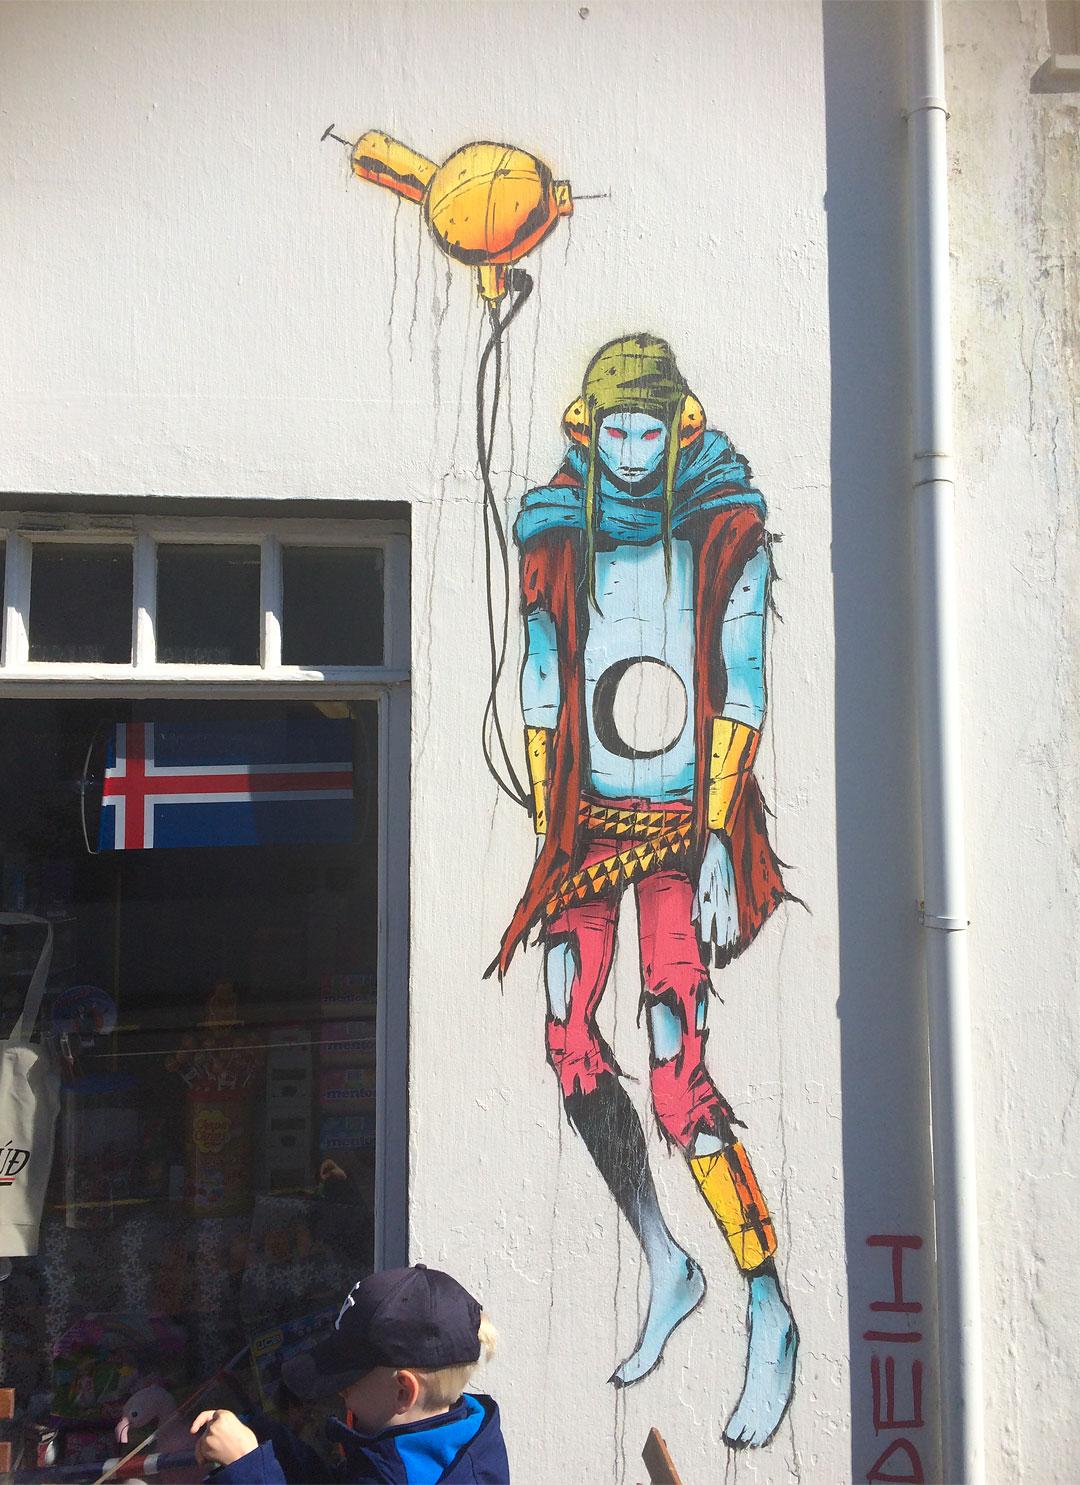 Cool graffiti in Reykjavik